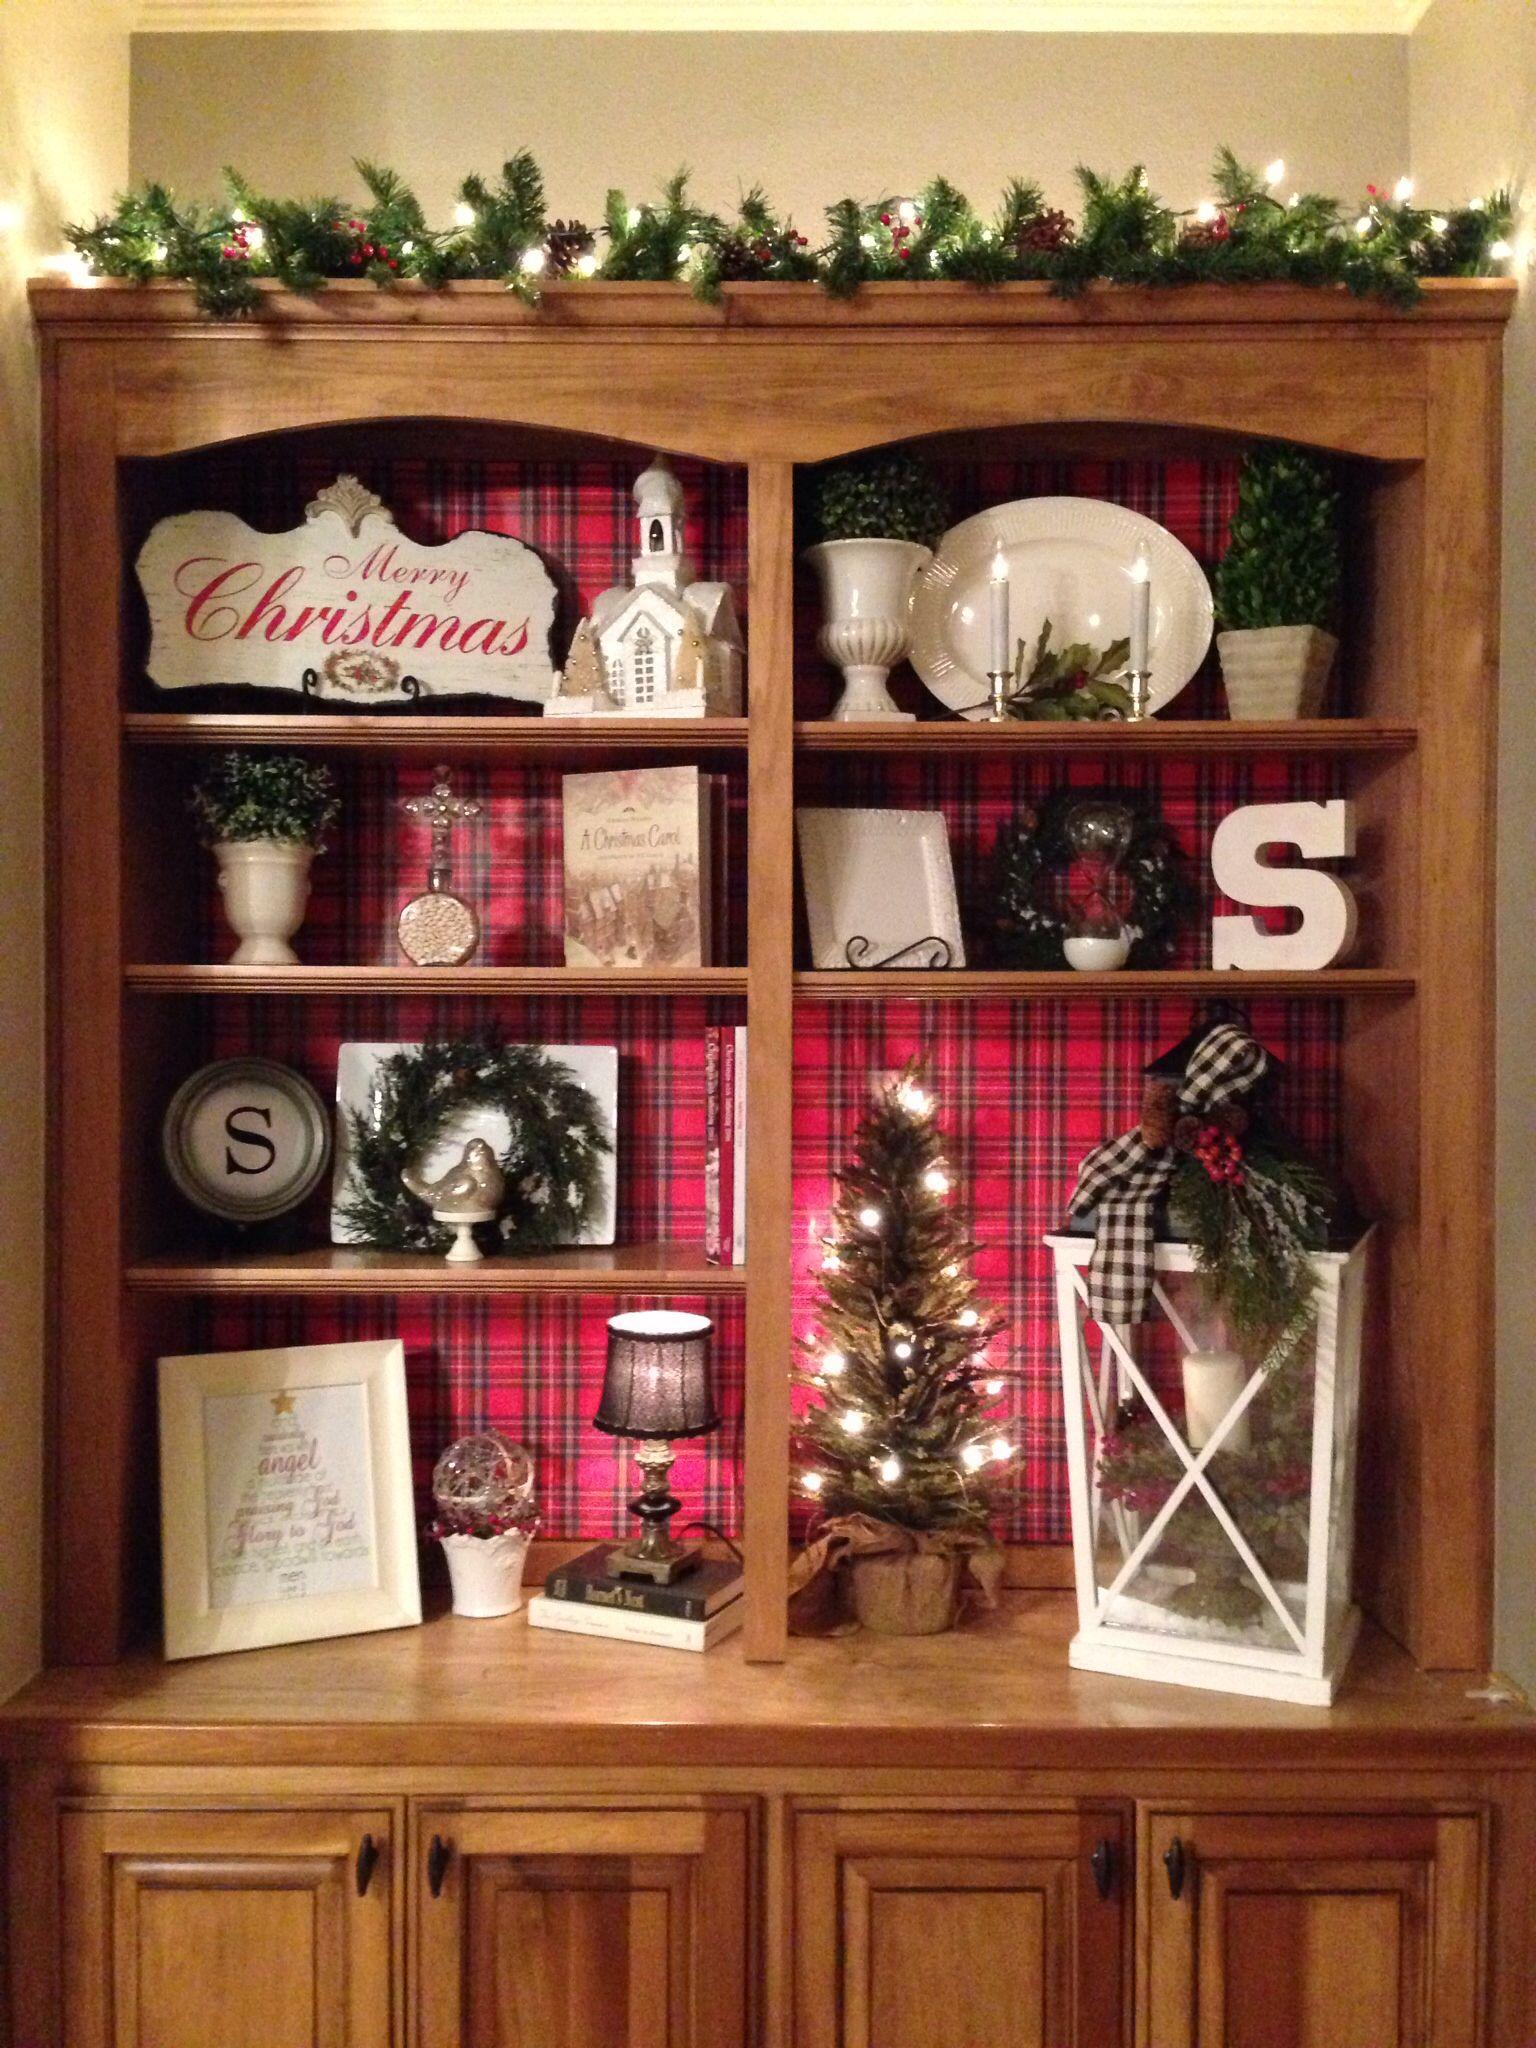 Christmas Bookshelves With Red Plaid Background Christmas Bookshelf Red Christmas Decor Decorating Bookshelves